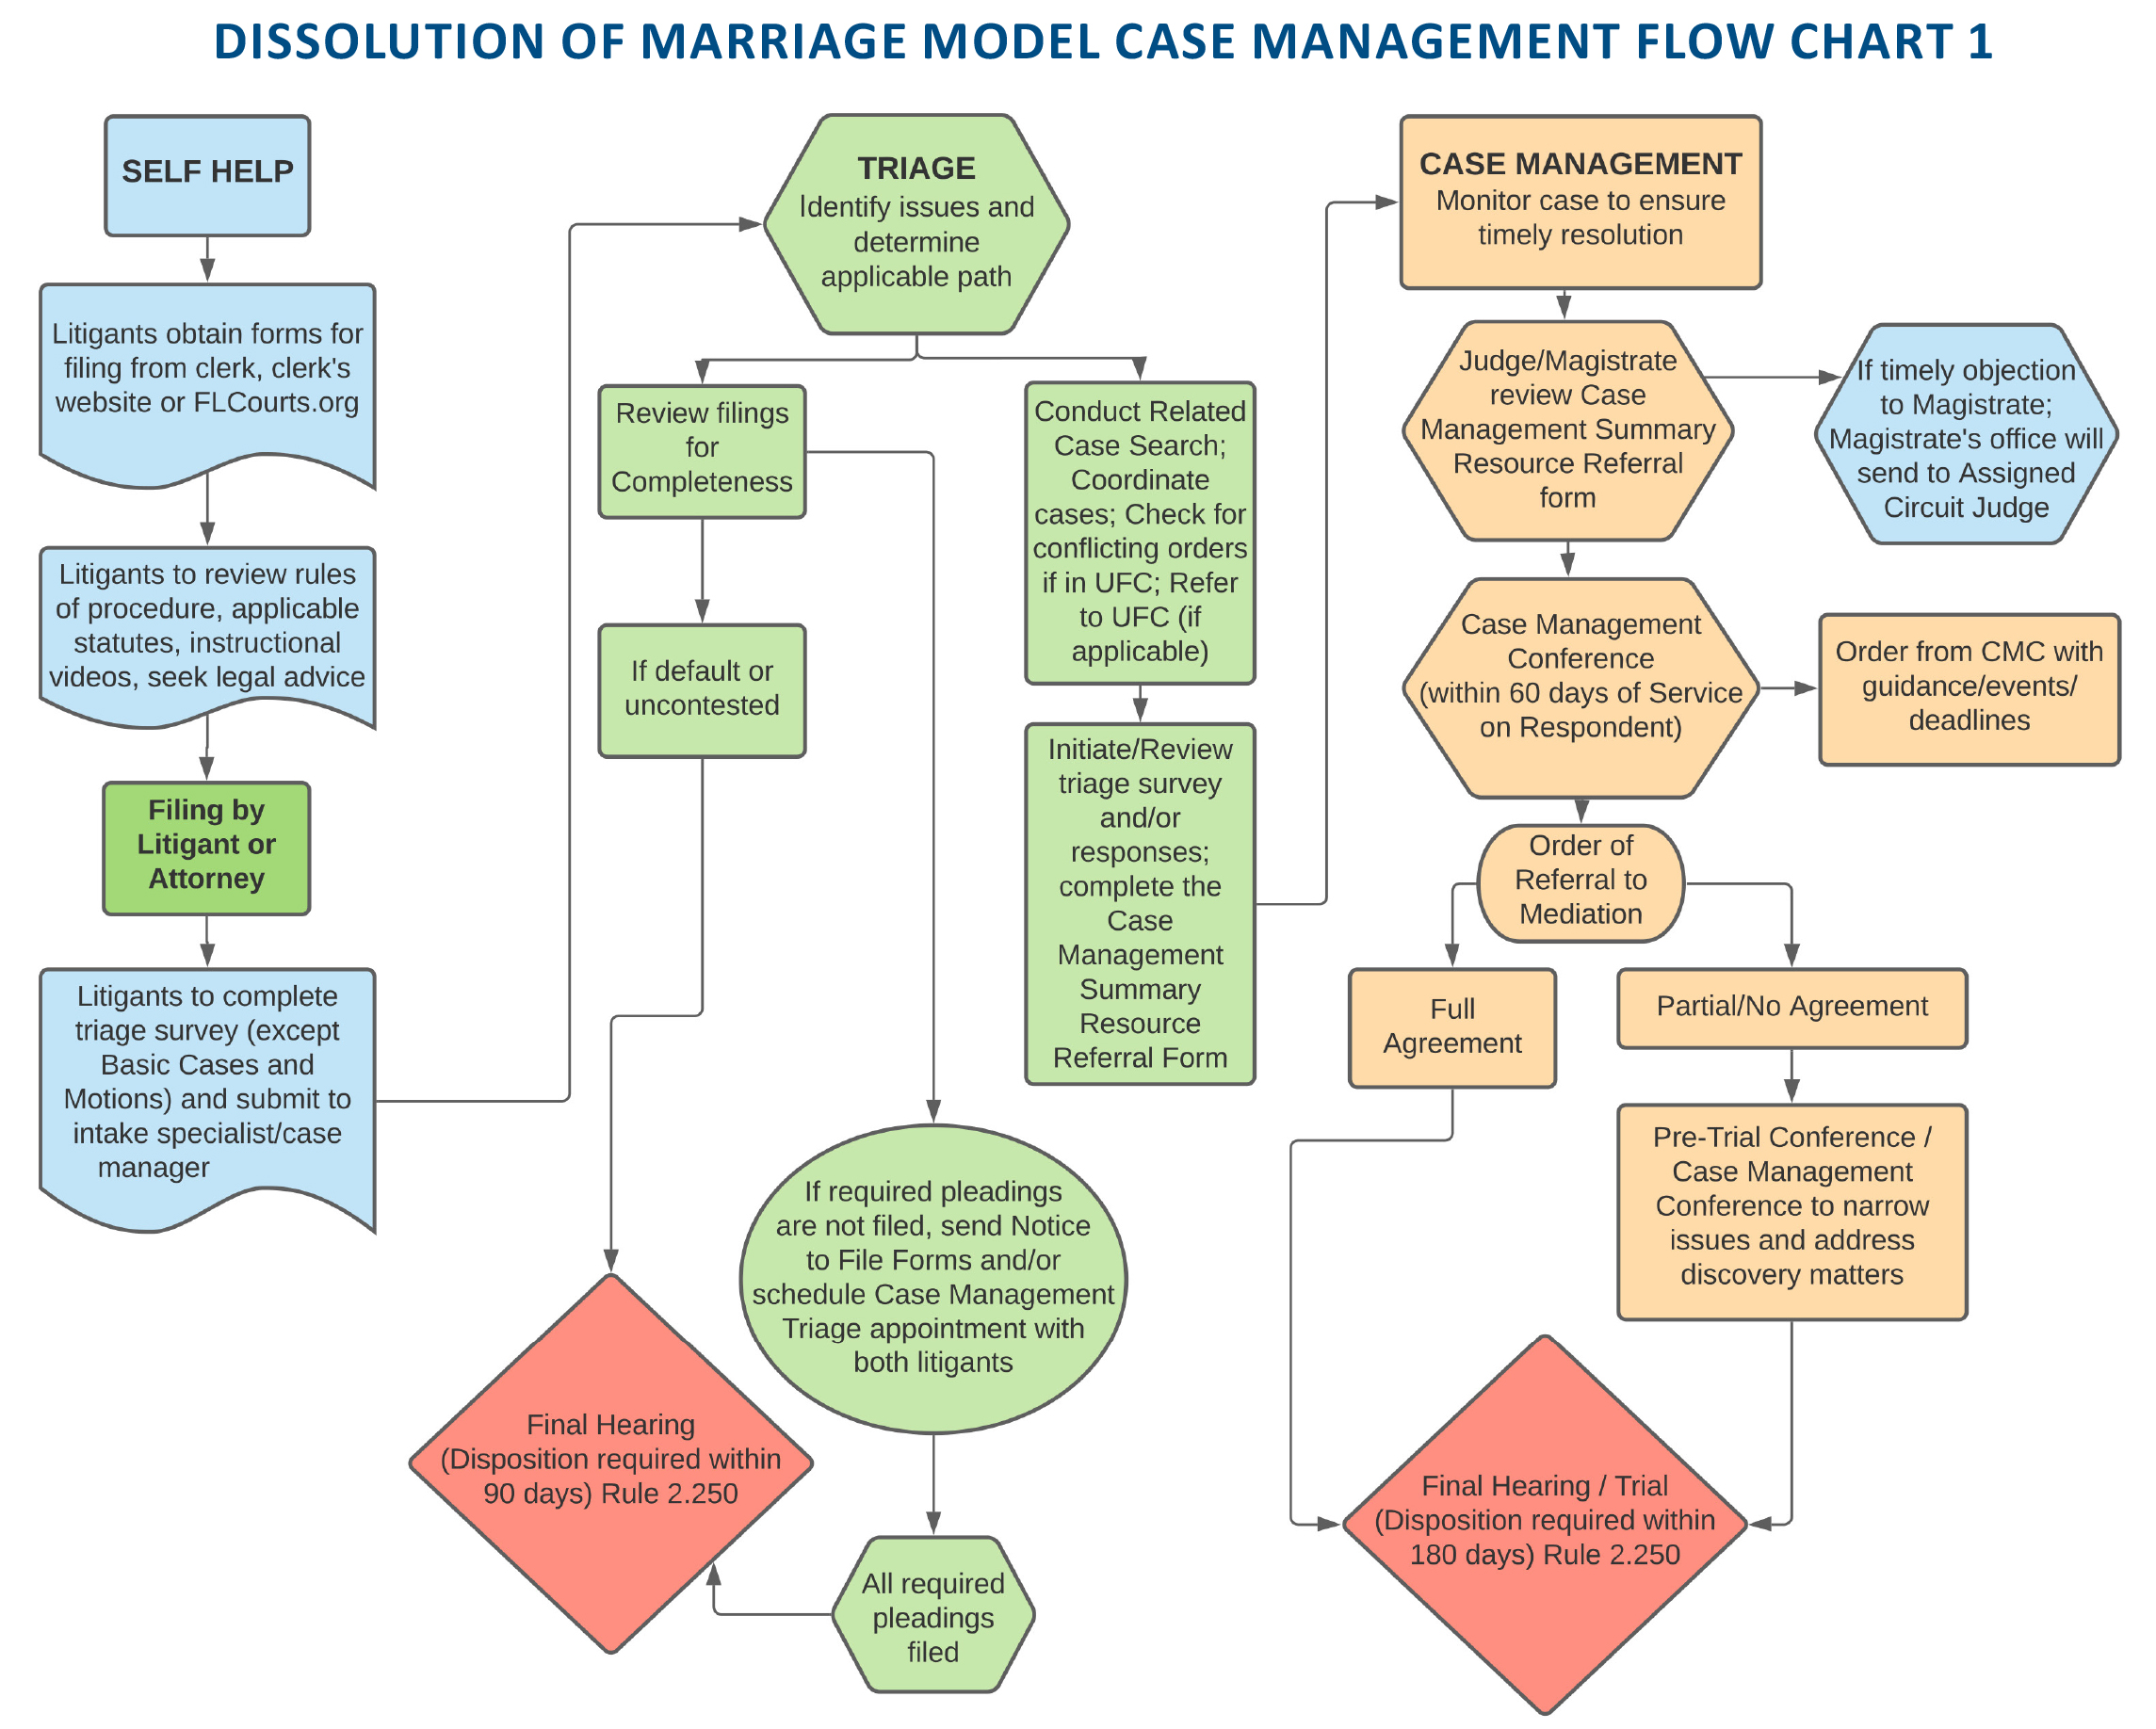 Dissolution of Marriage Model Case Management Flow Chart 1